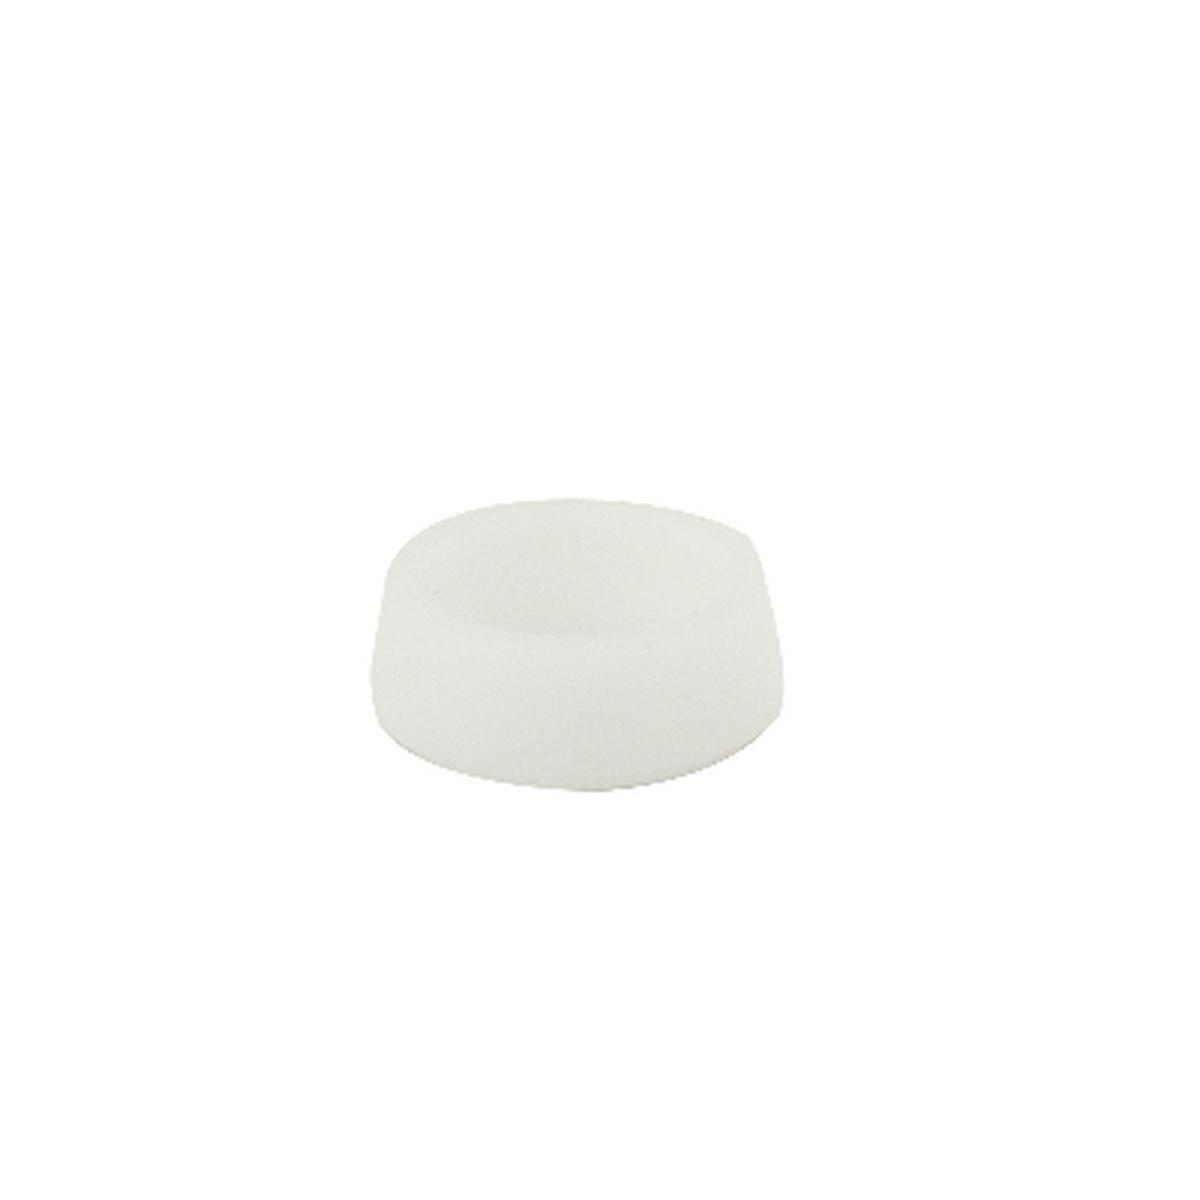 BrassCraft® 60PT Compression Tube Sleeve, 3/8 in, x 0.19 in Thk, Plastic, Domestic